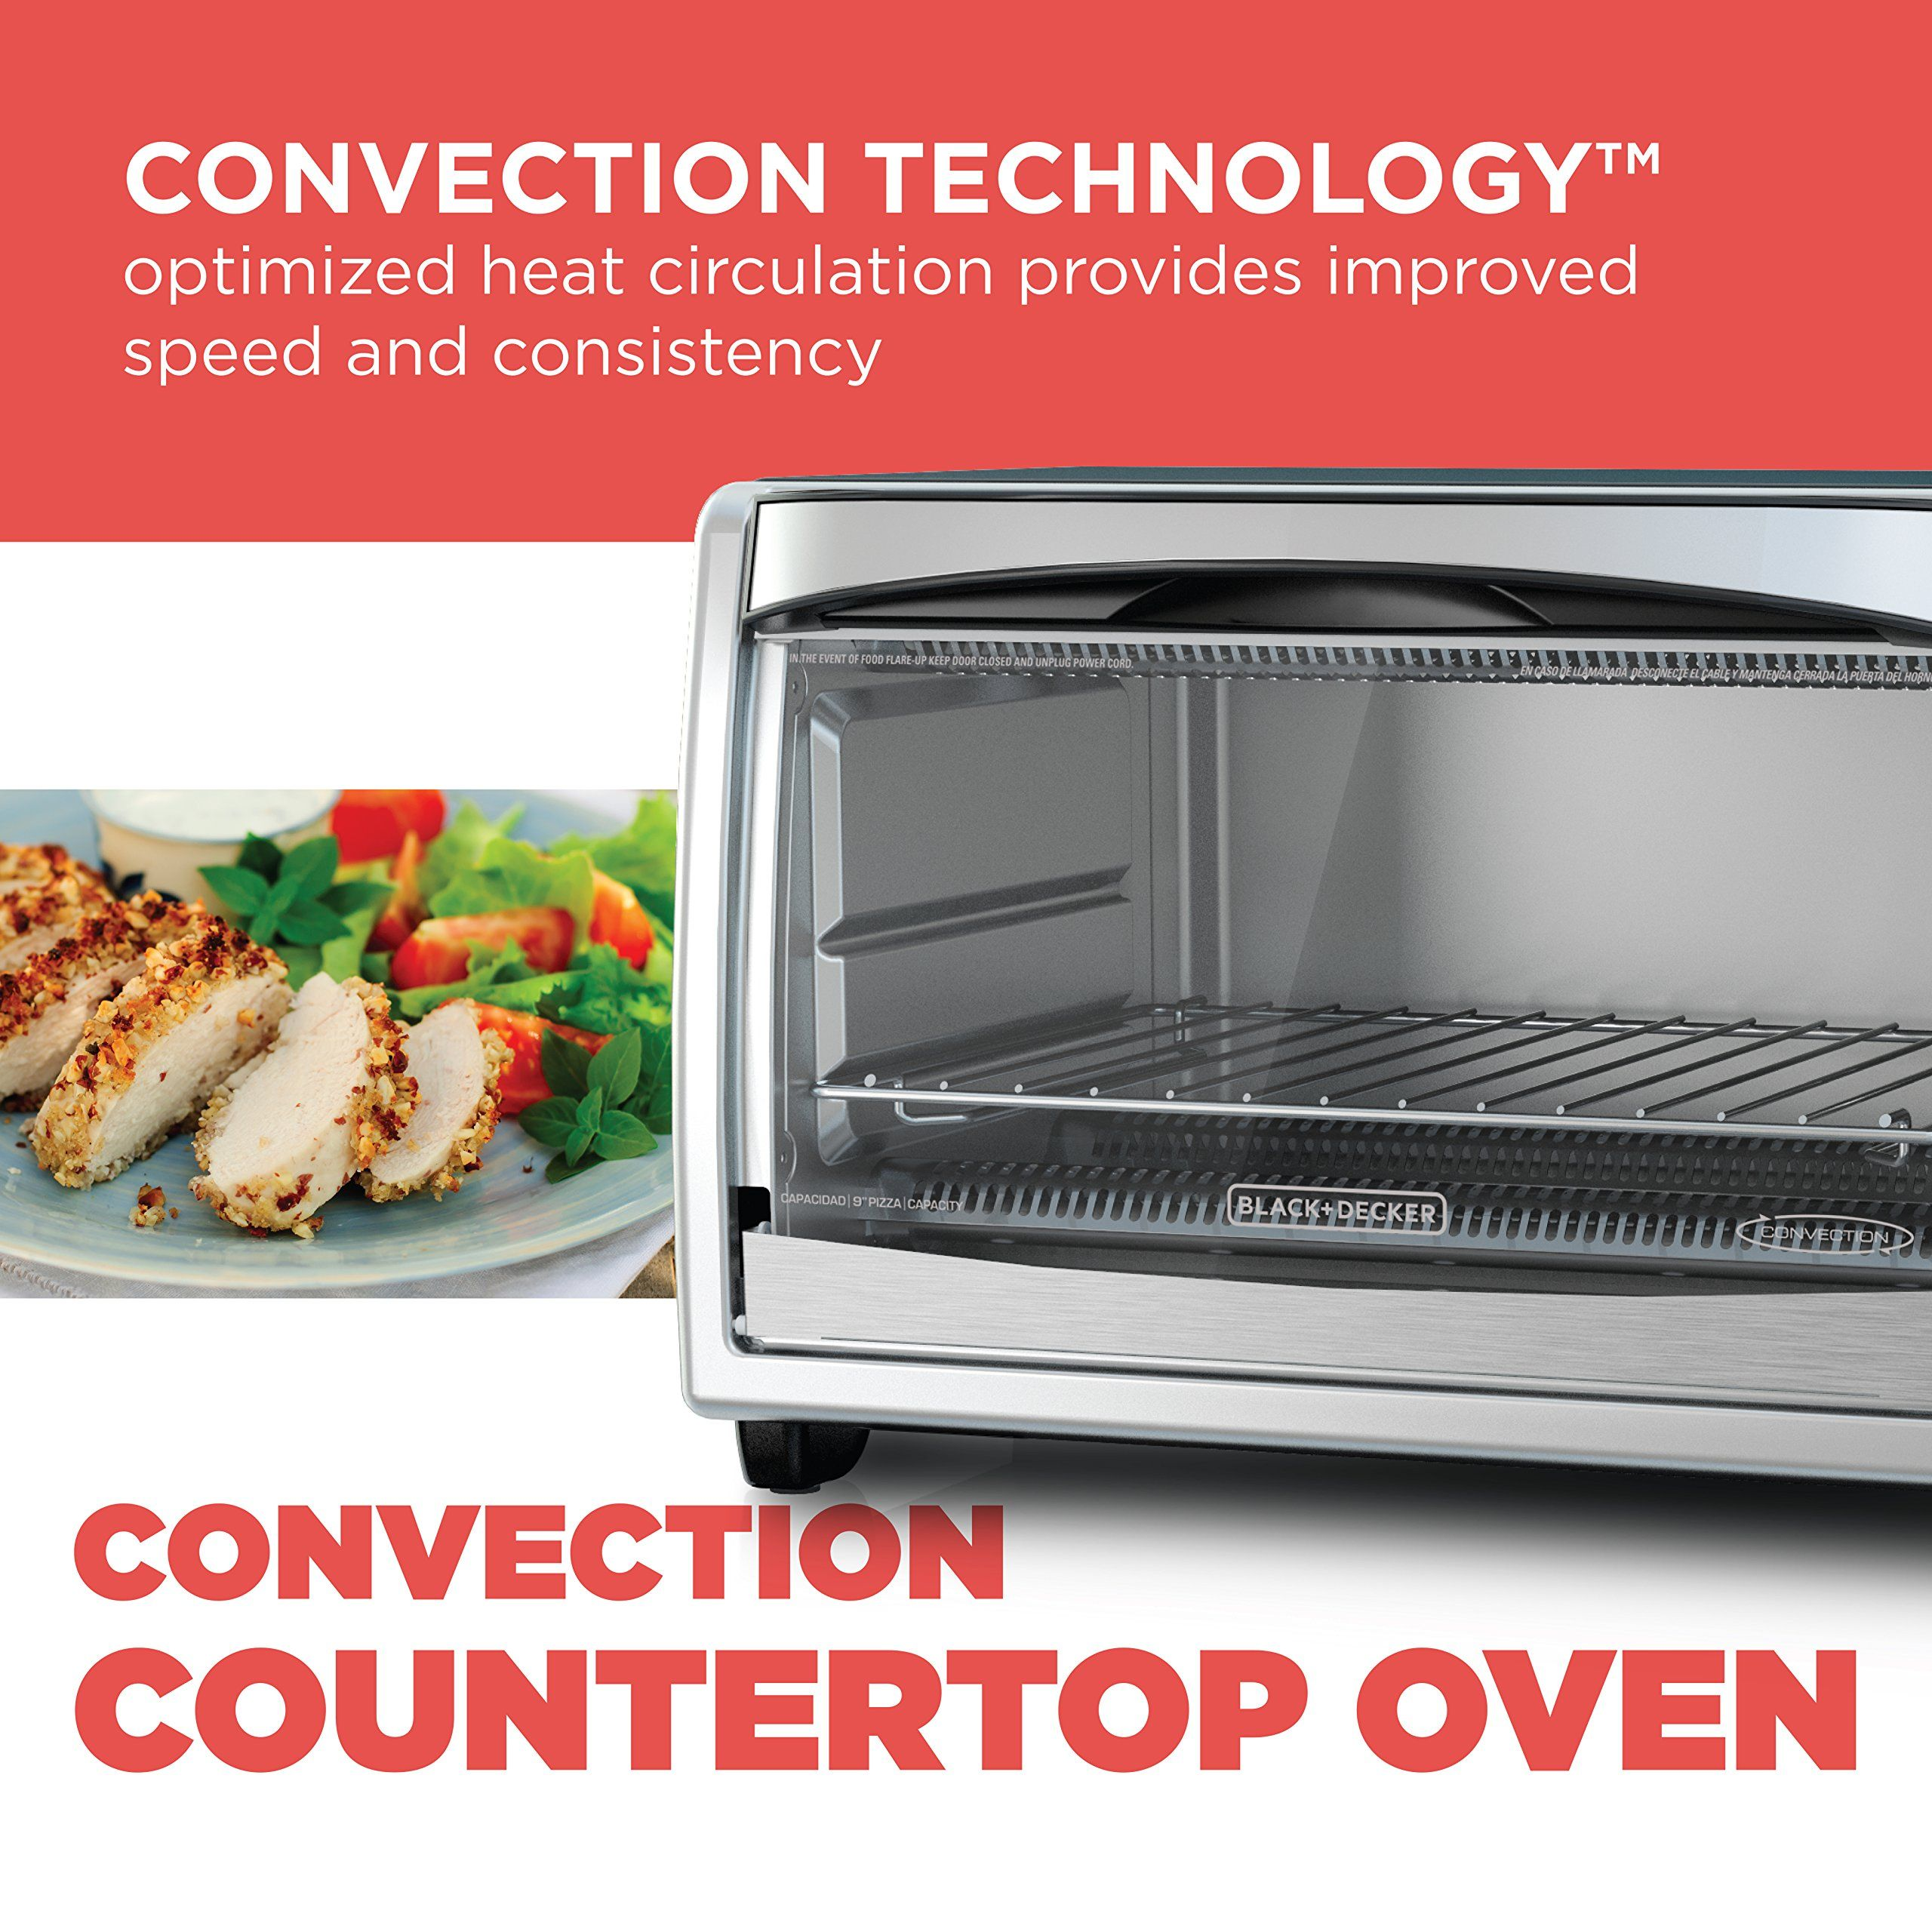 Black decker to1675b 6slice convection countertop toaster